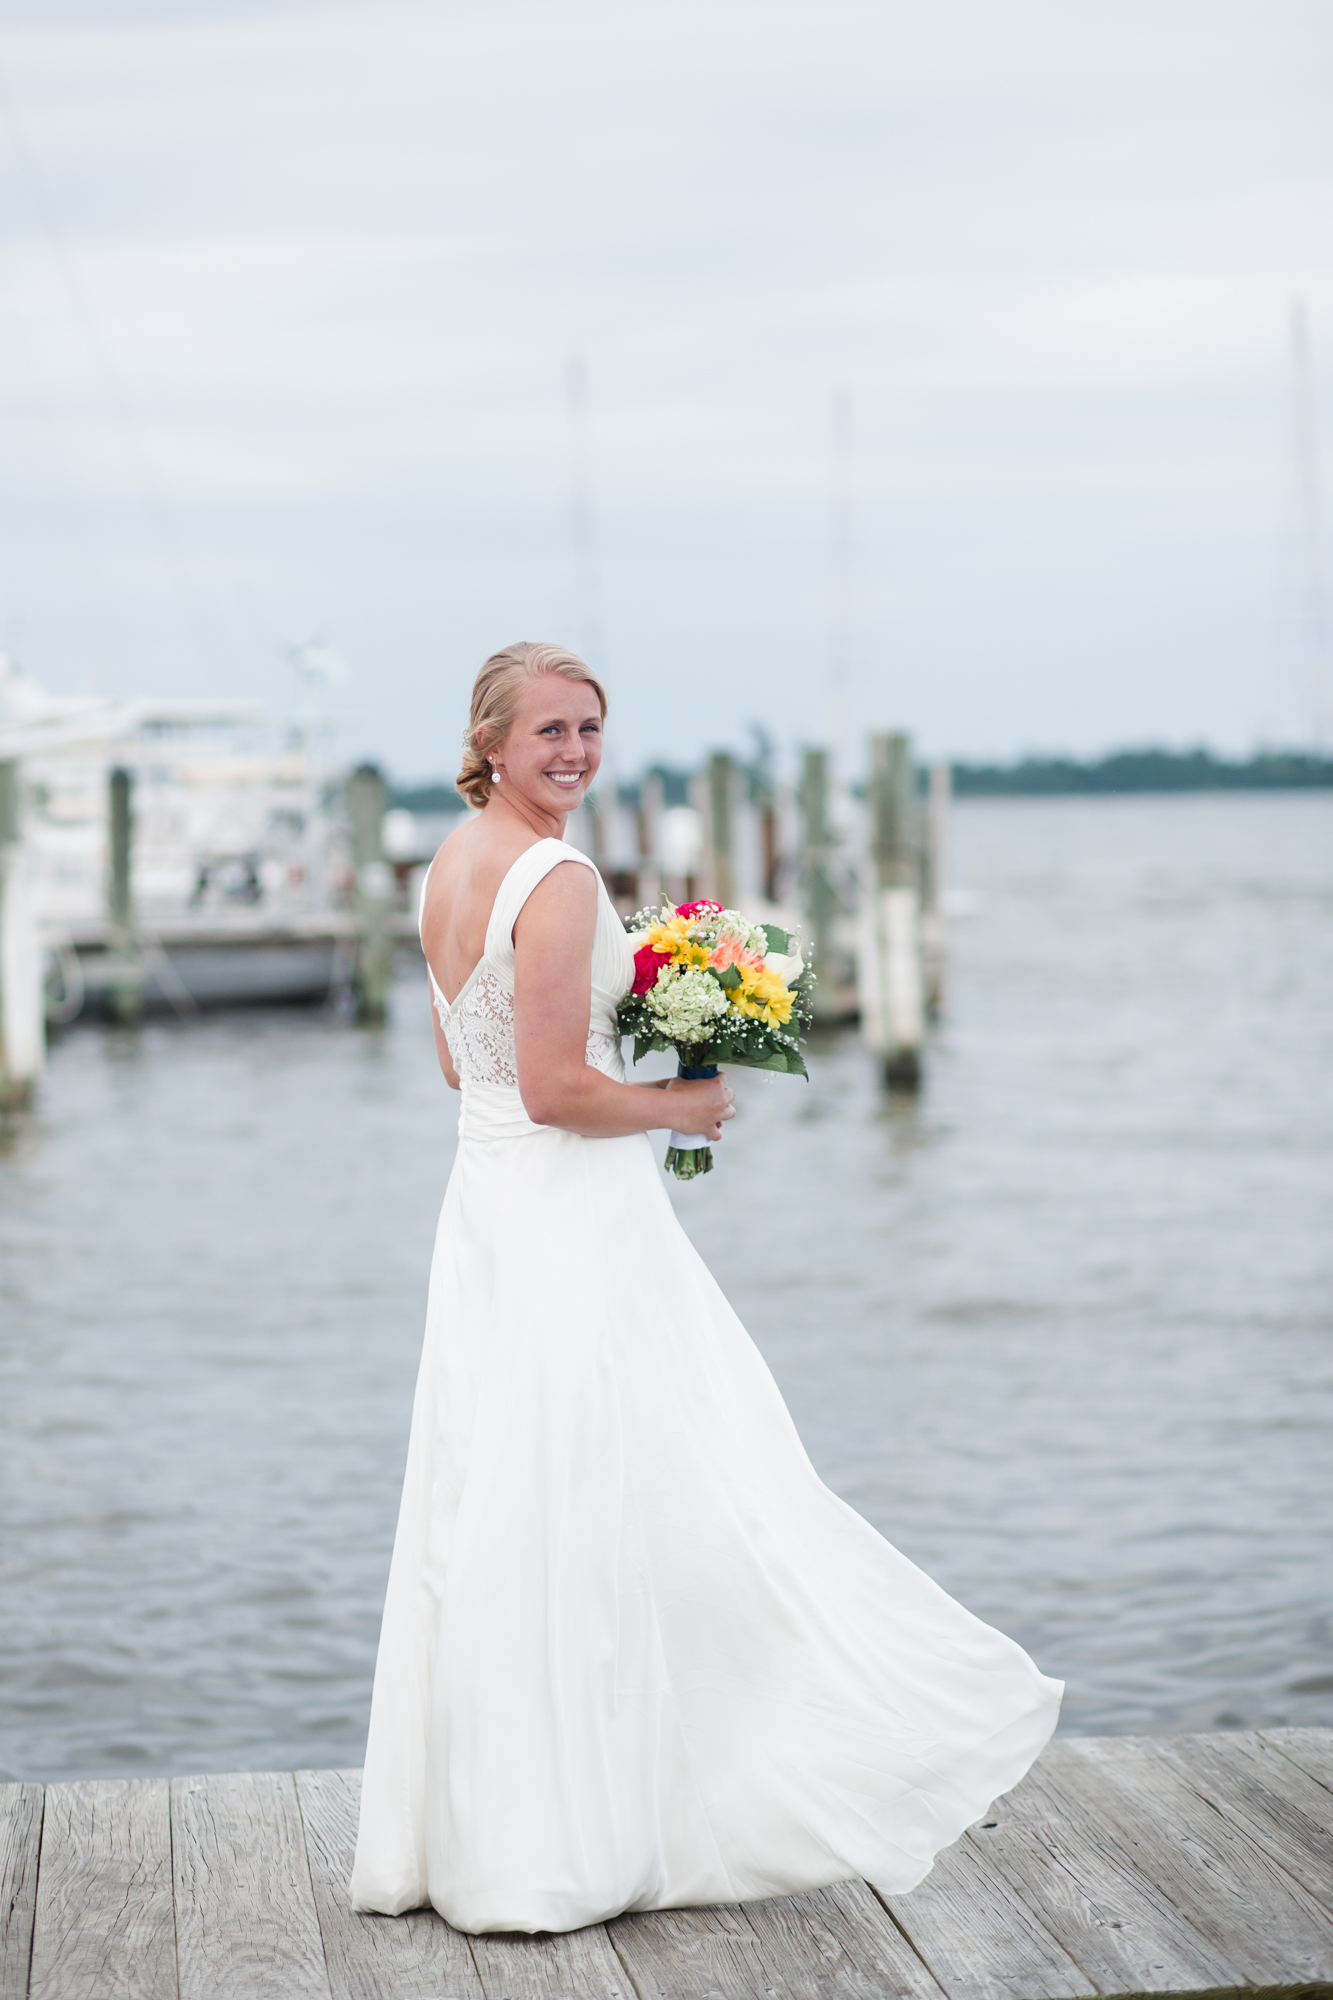 2017_05_27_ray_caroline_naval_wedding-3254.jpg